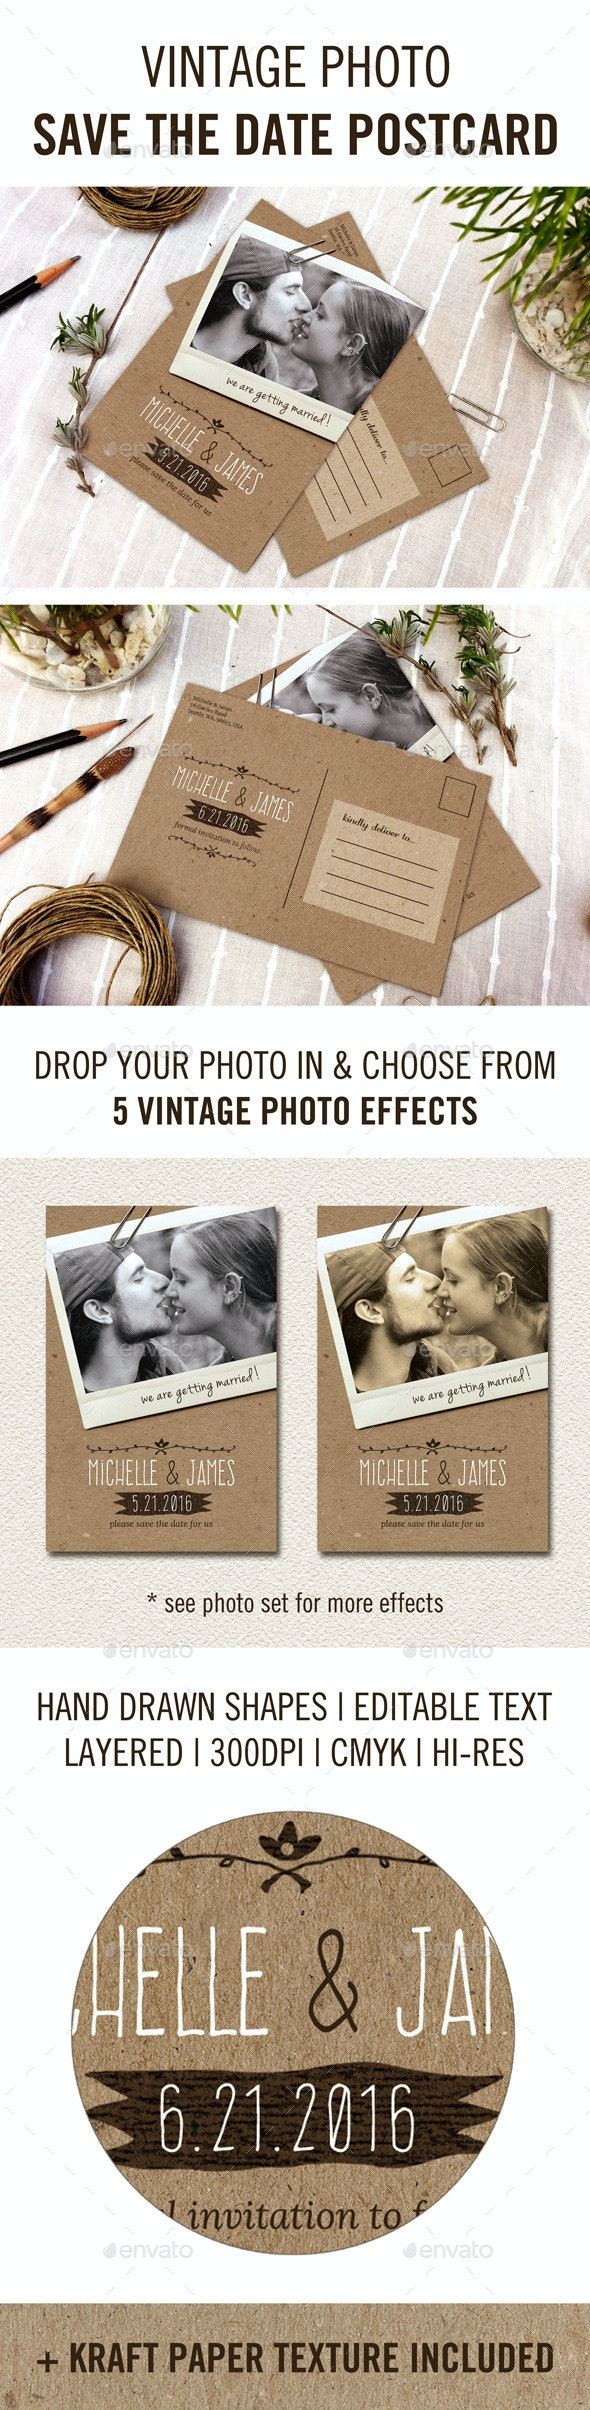 Vintage Photo Save the Date Postcard - Weddings Cards & Invites